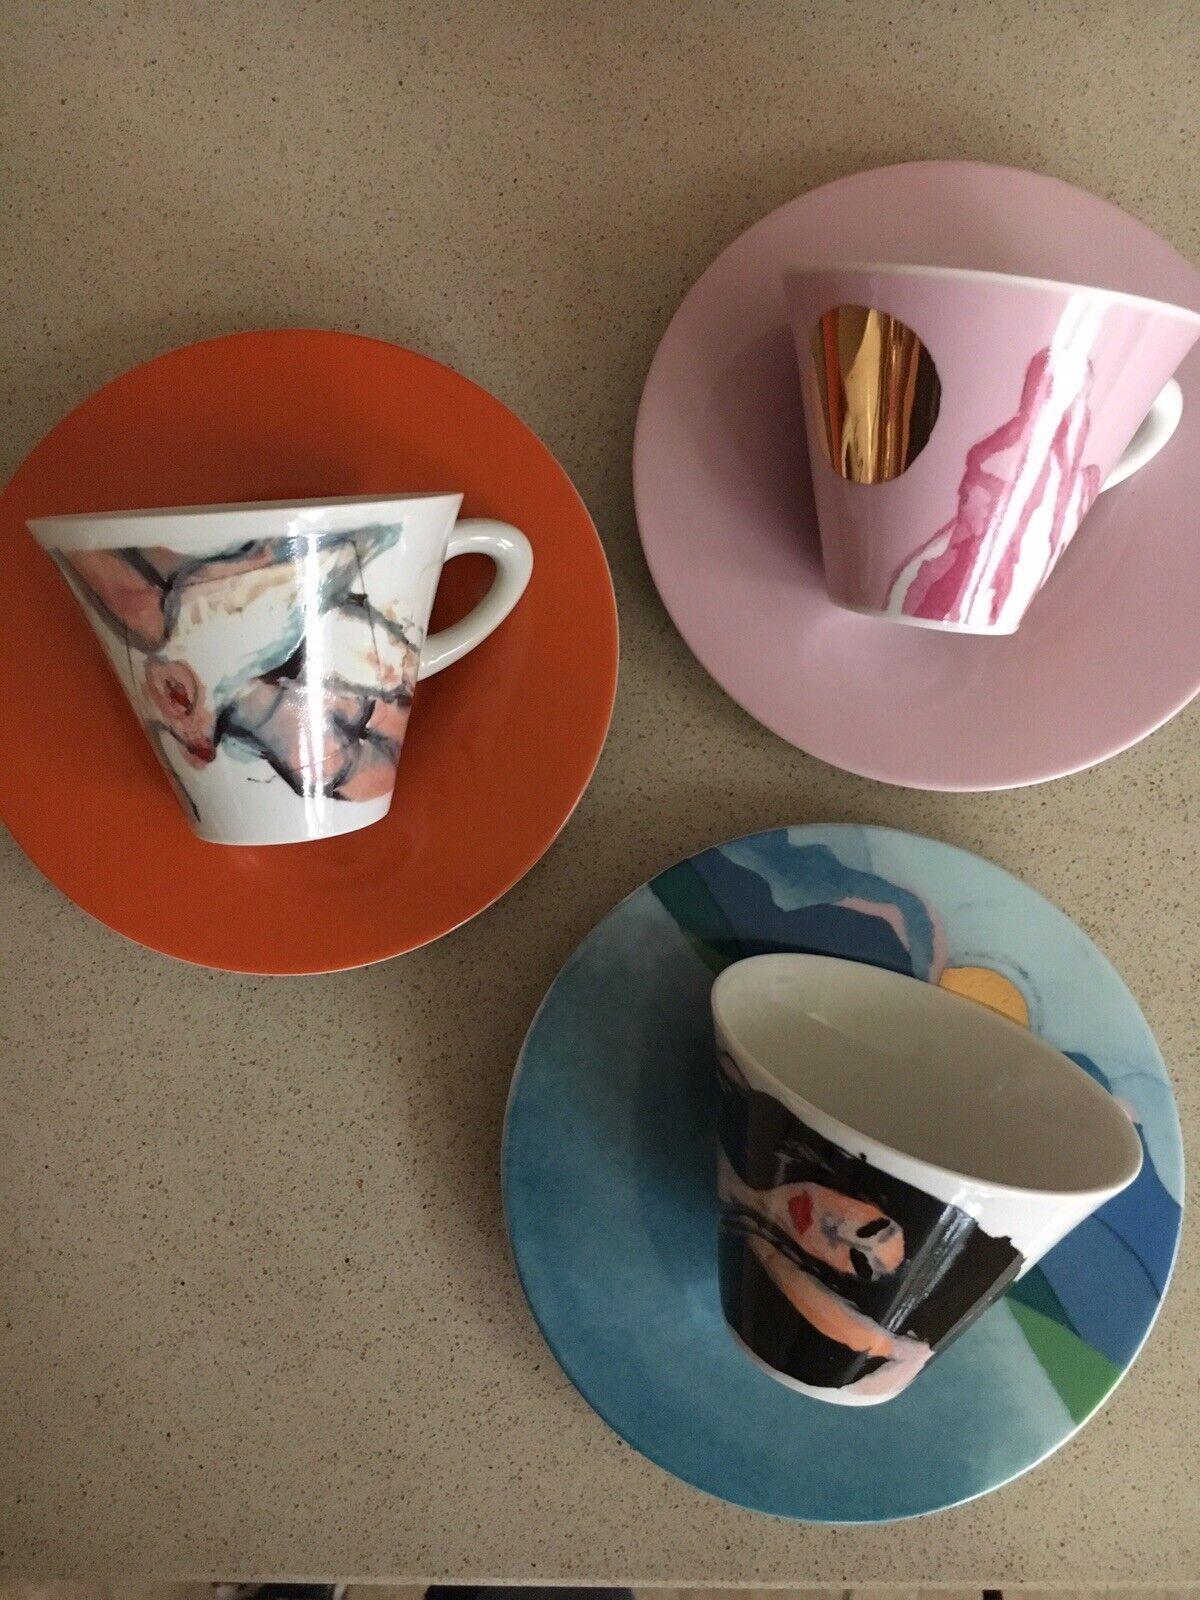 Illy Espresso et Cappucino Tasses-Collectors OBJET Francis Francis-SOTTSASS